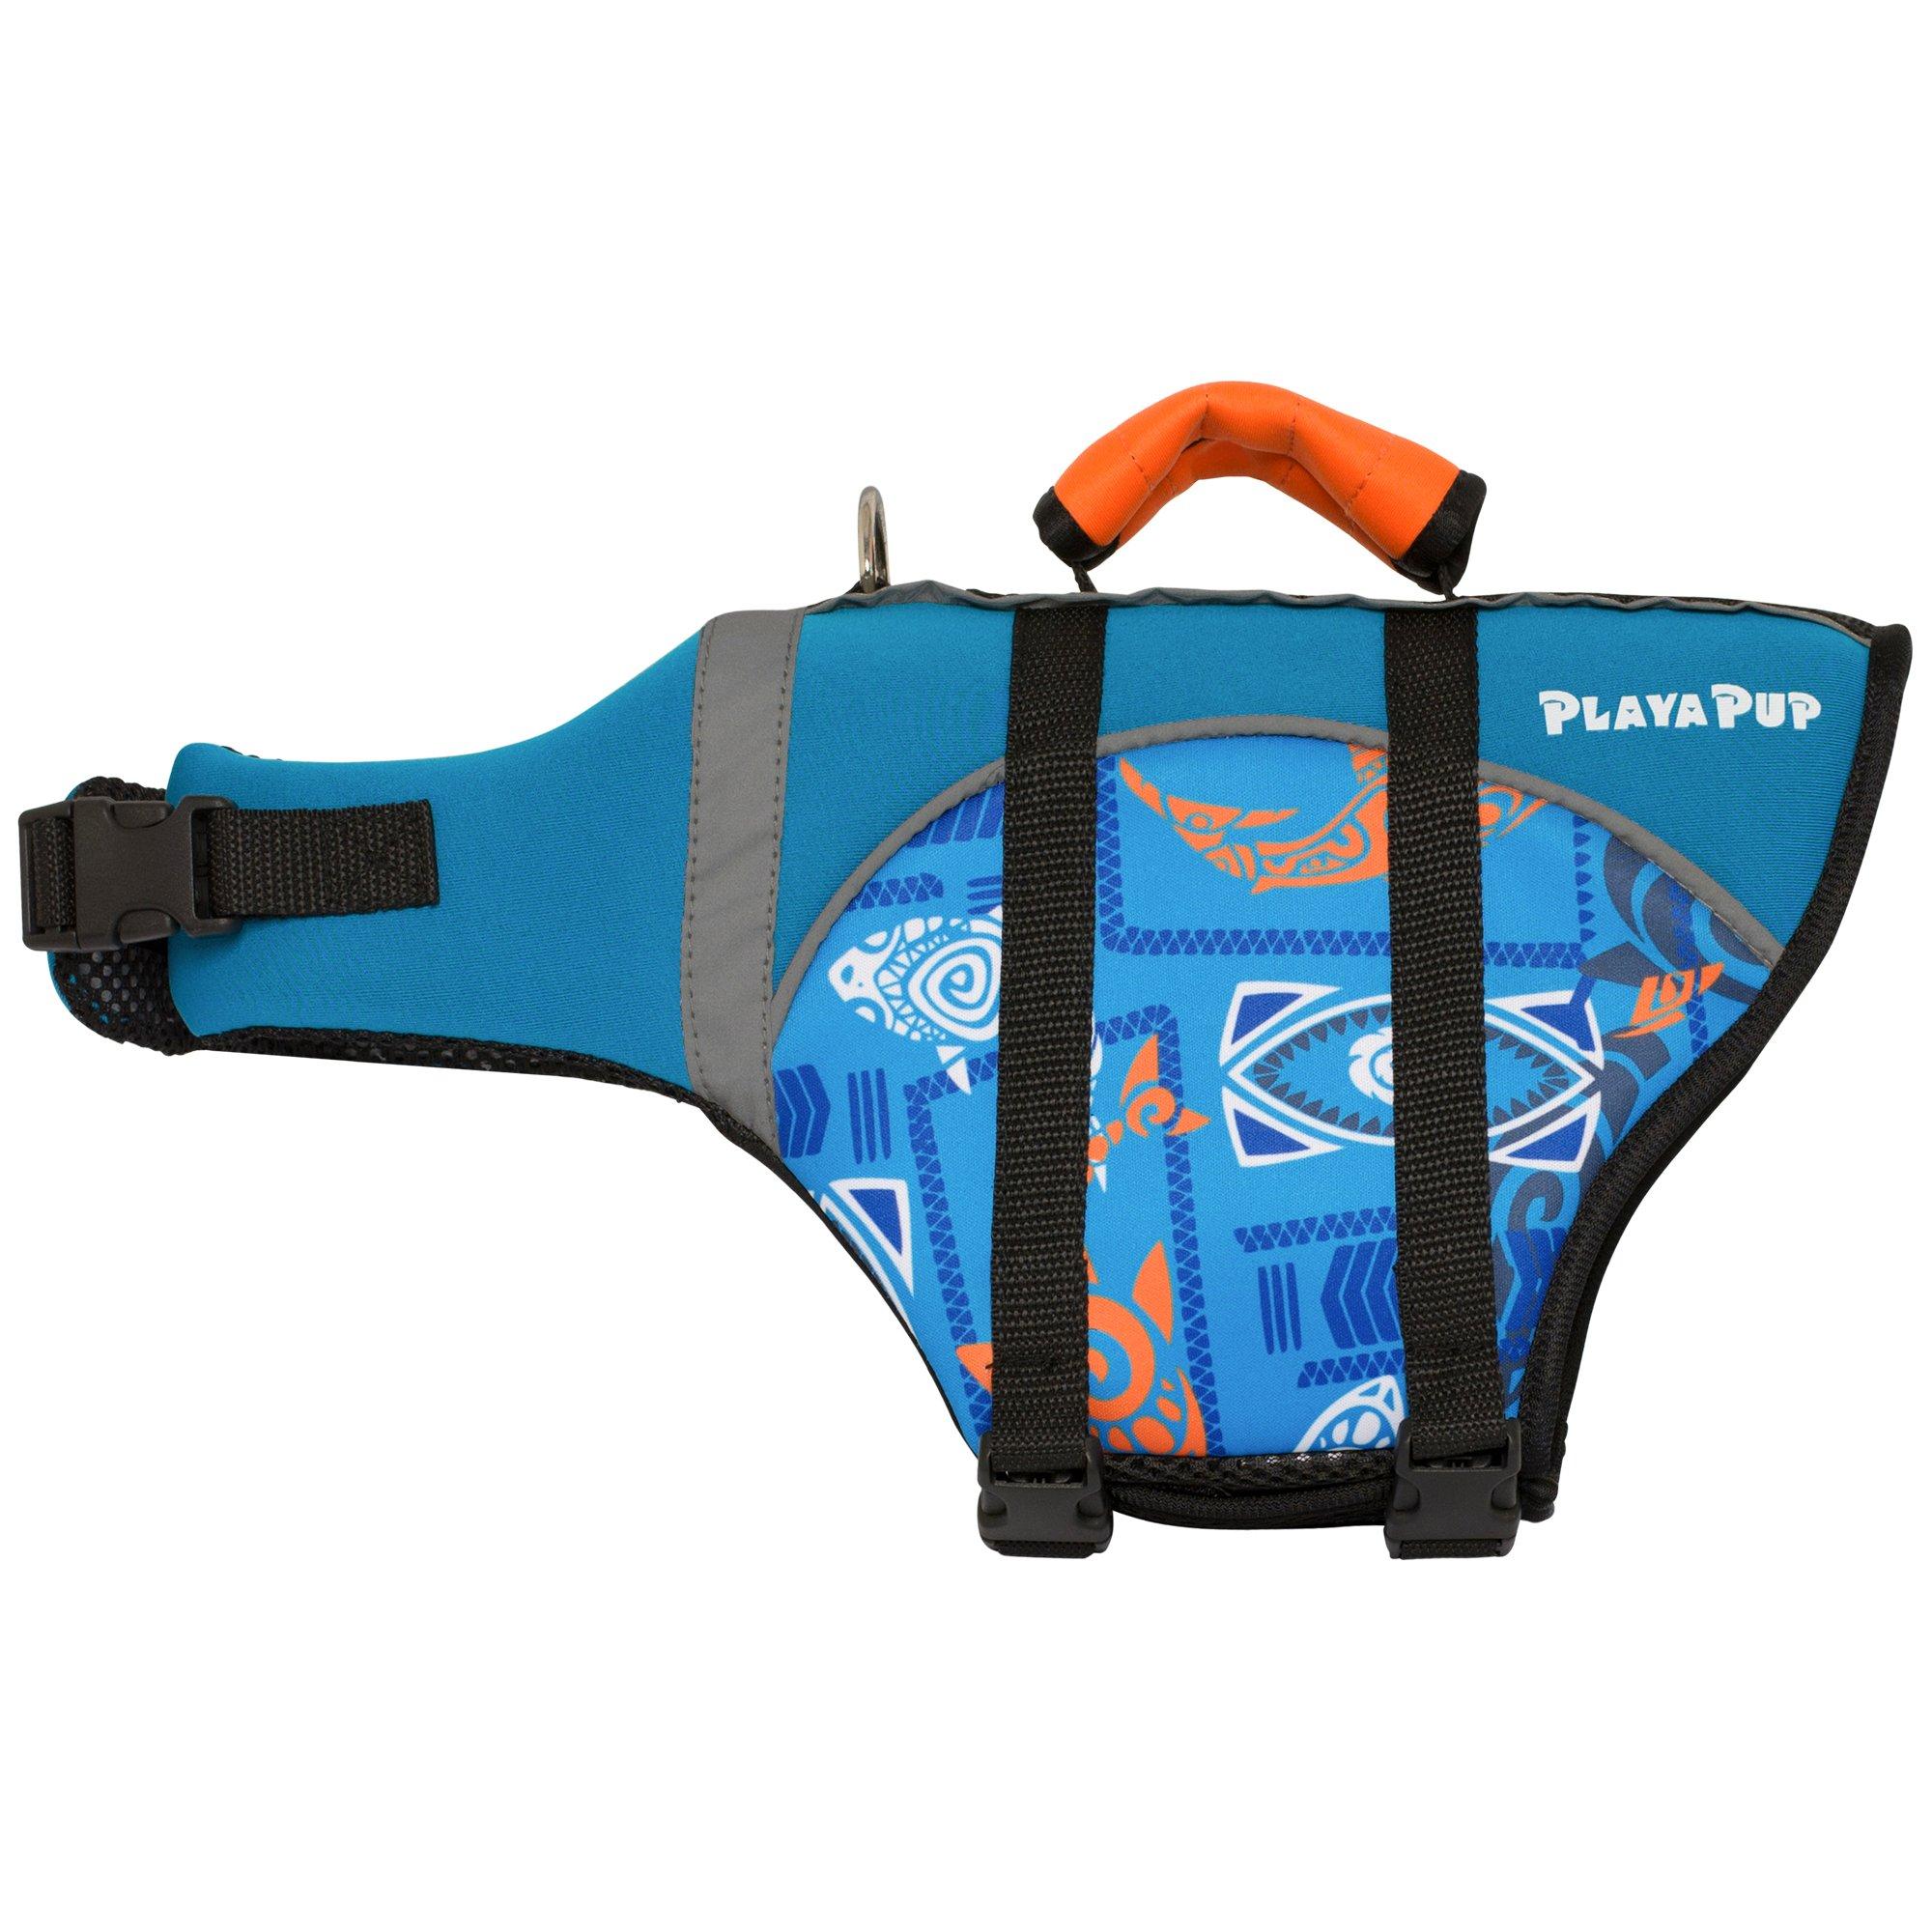 Image of Playa Pup Pet Flotation Vest Blue Shark, X-Small, Blue / Orange